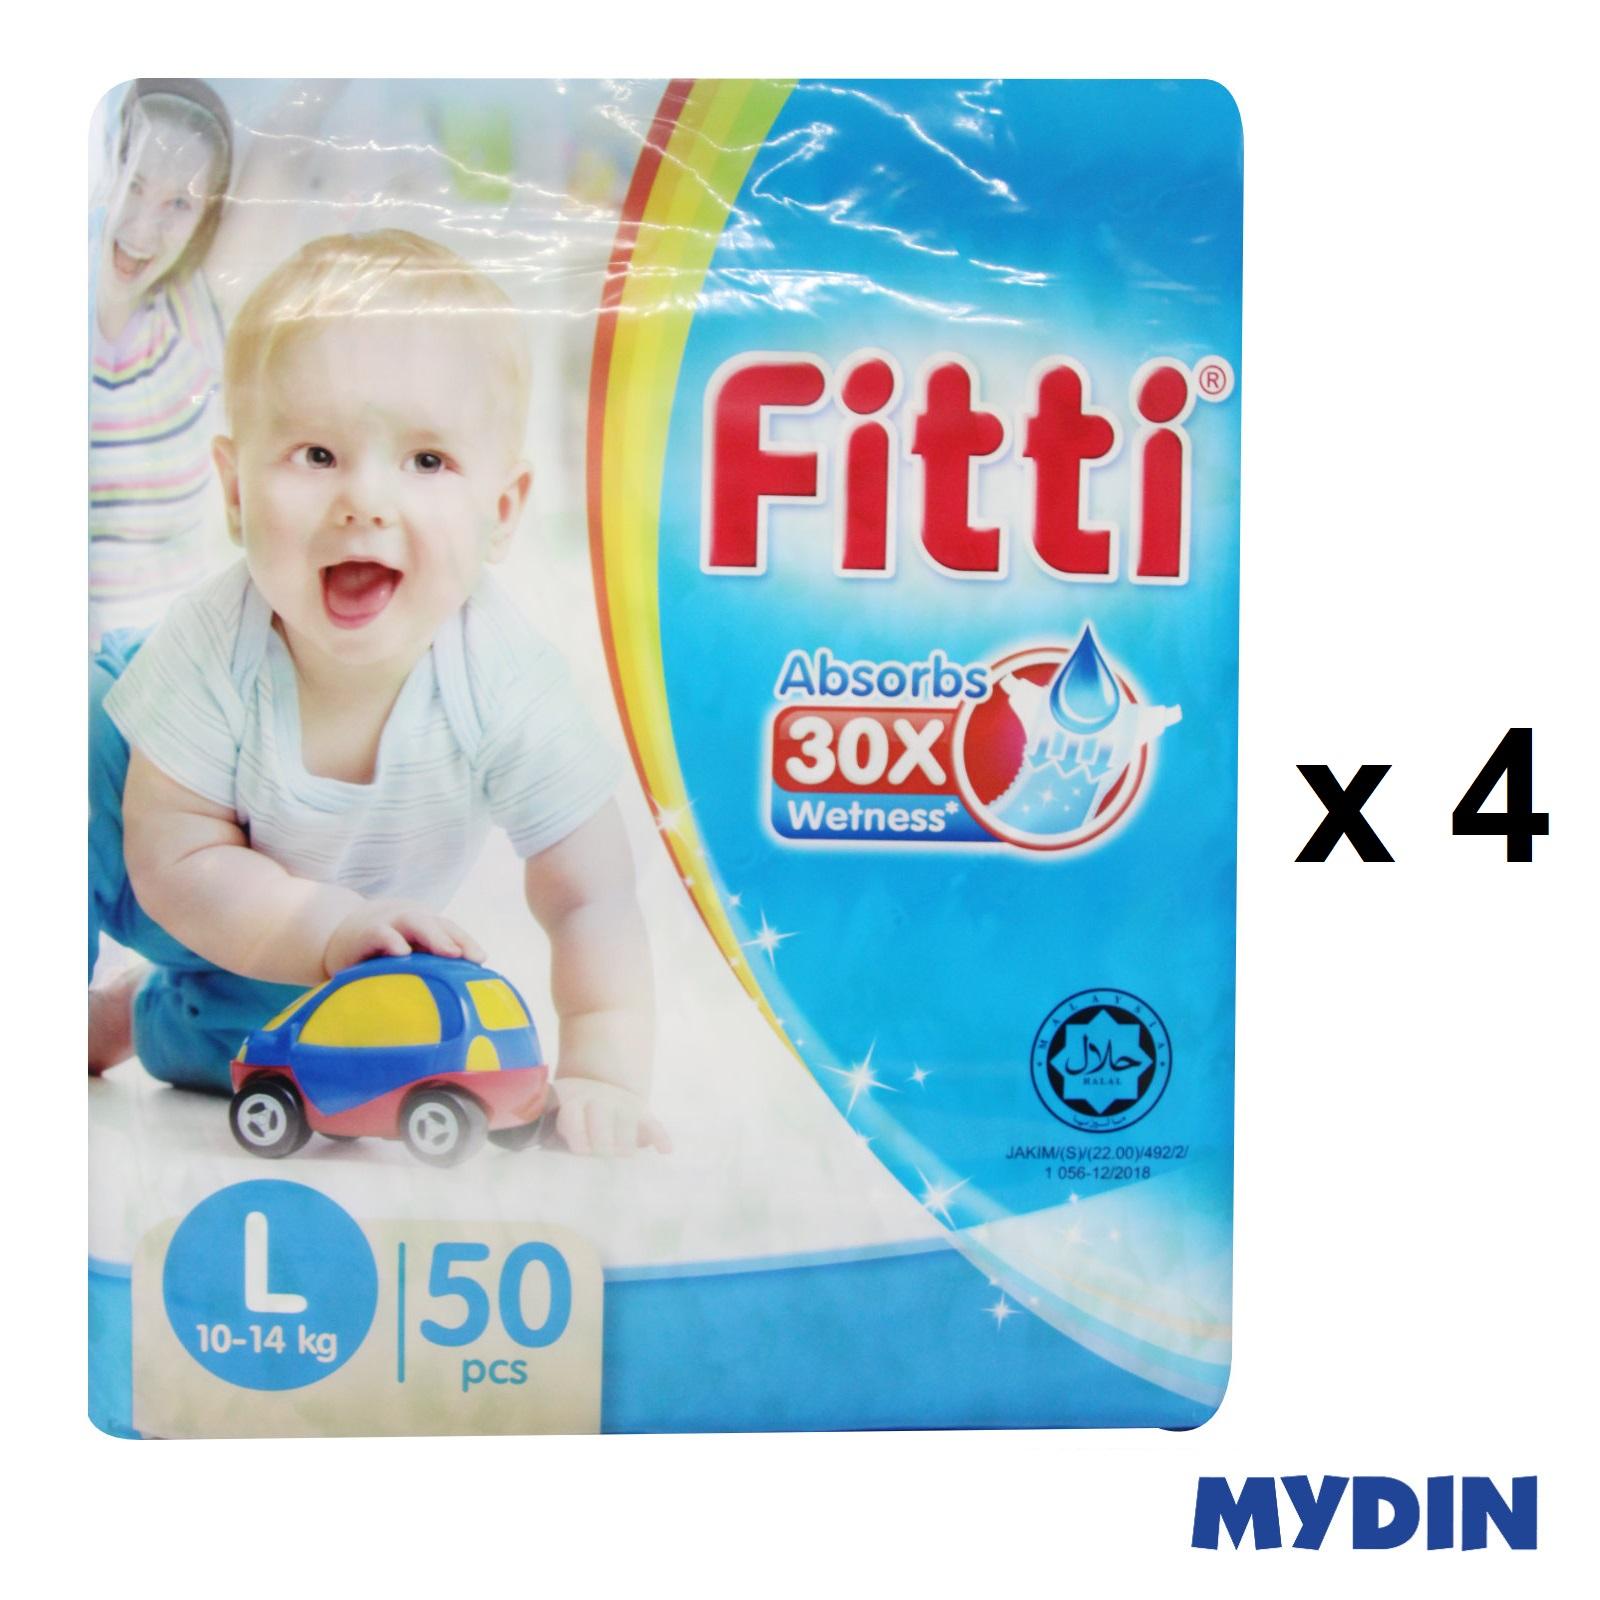 Fitti Jumbo Pack L50 x 4 Packs